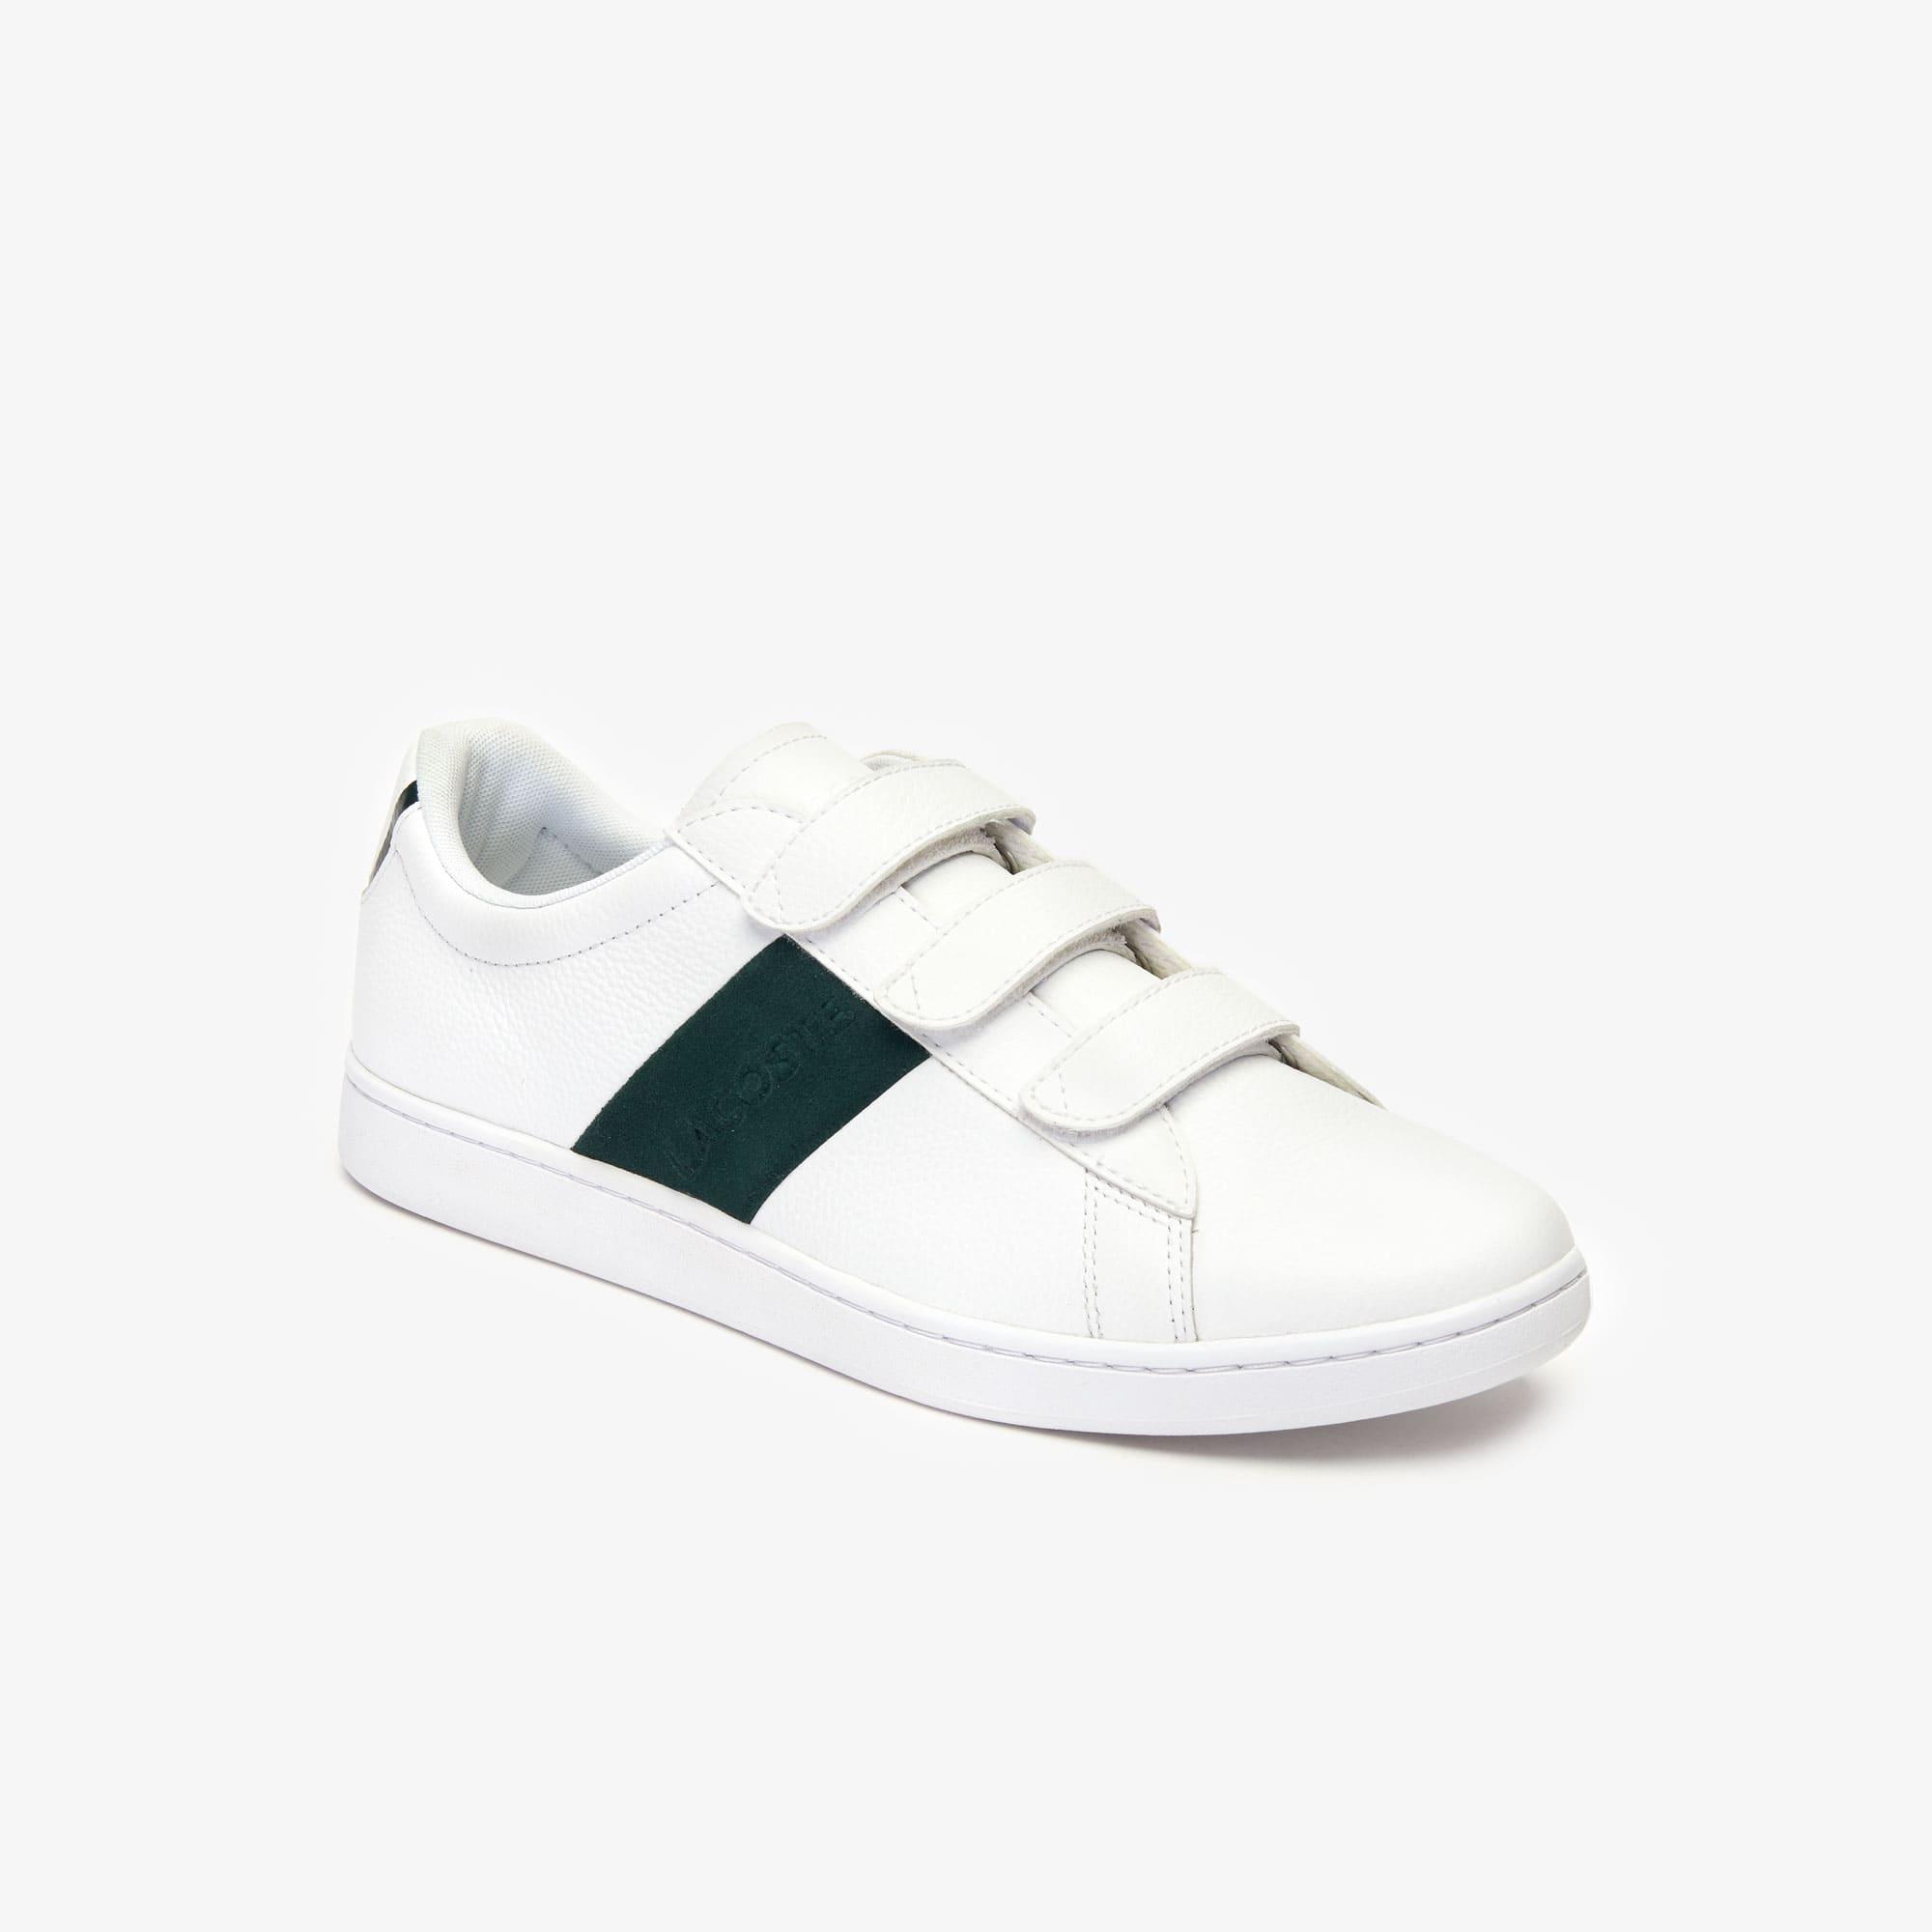 Toutes ChaussuresHomme Les Toutes Lacoste Les Nyvwm8n0O